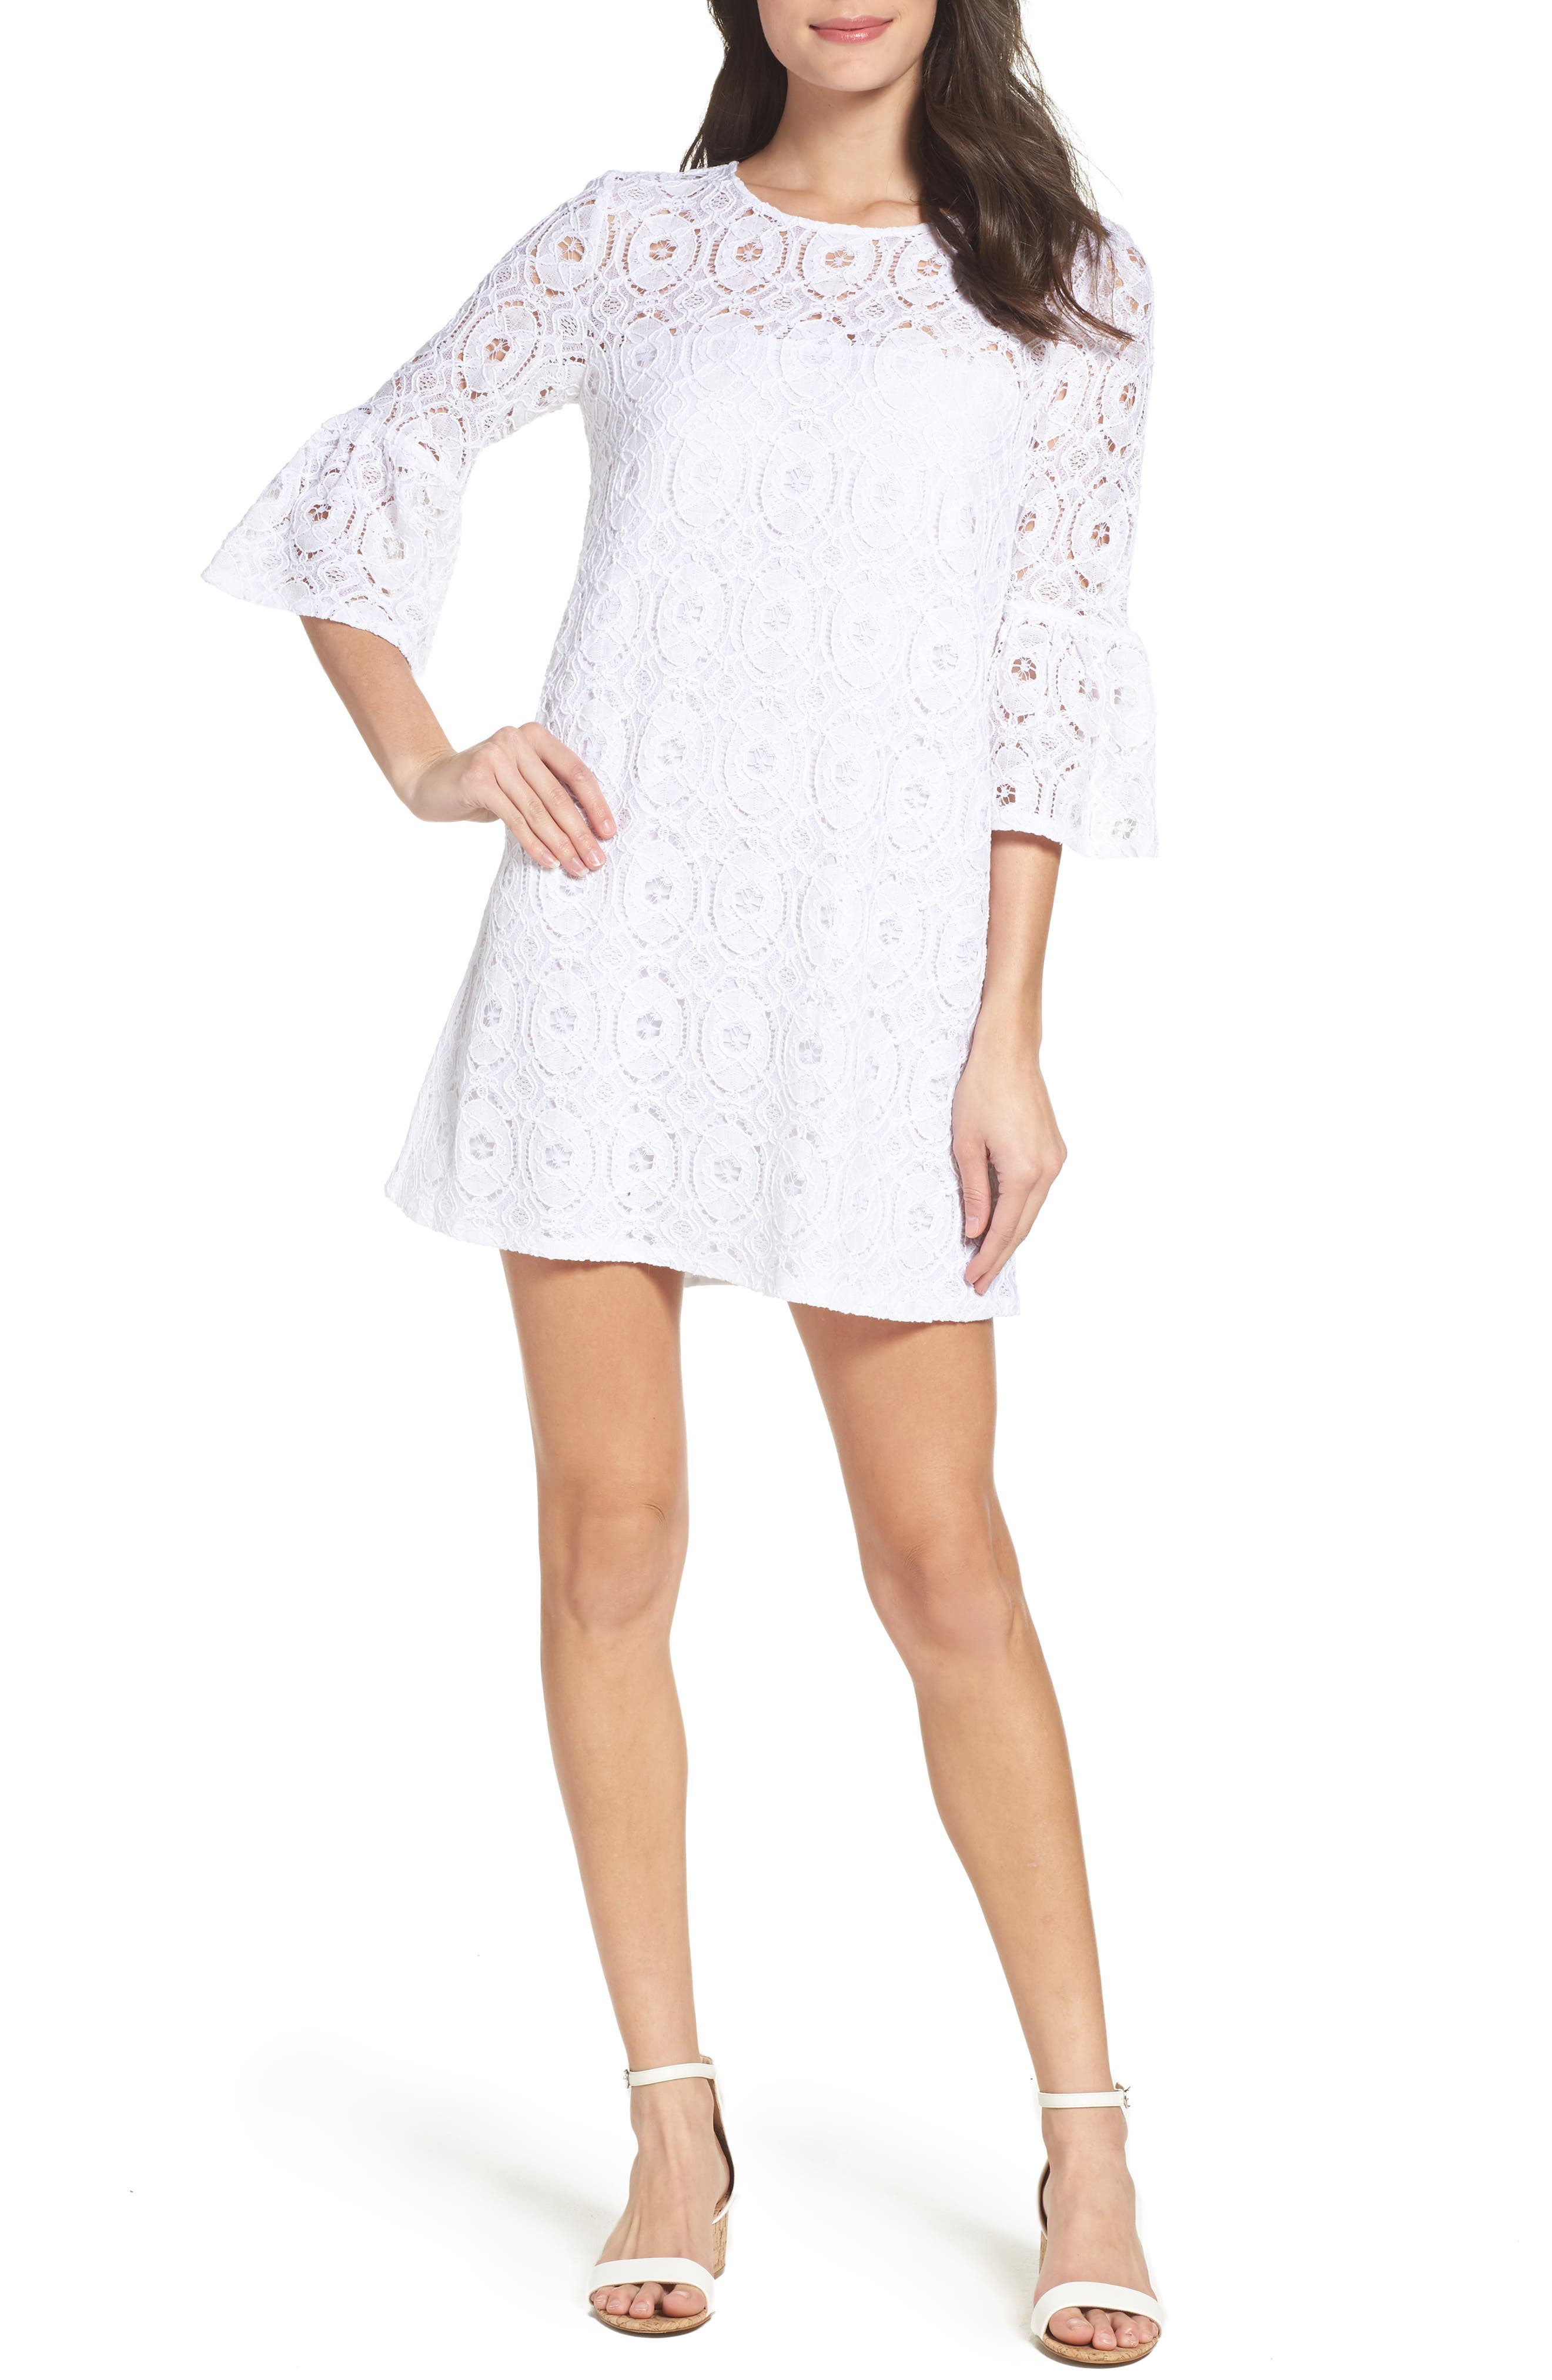 Alternate Image 1 Selected - BB Dakota Jesper Bell Sleeve Lace Shift Dress